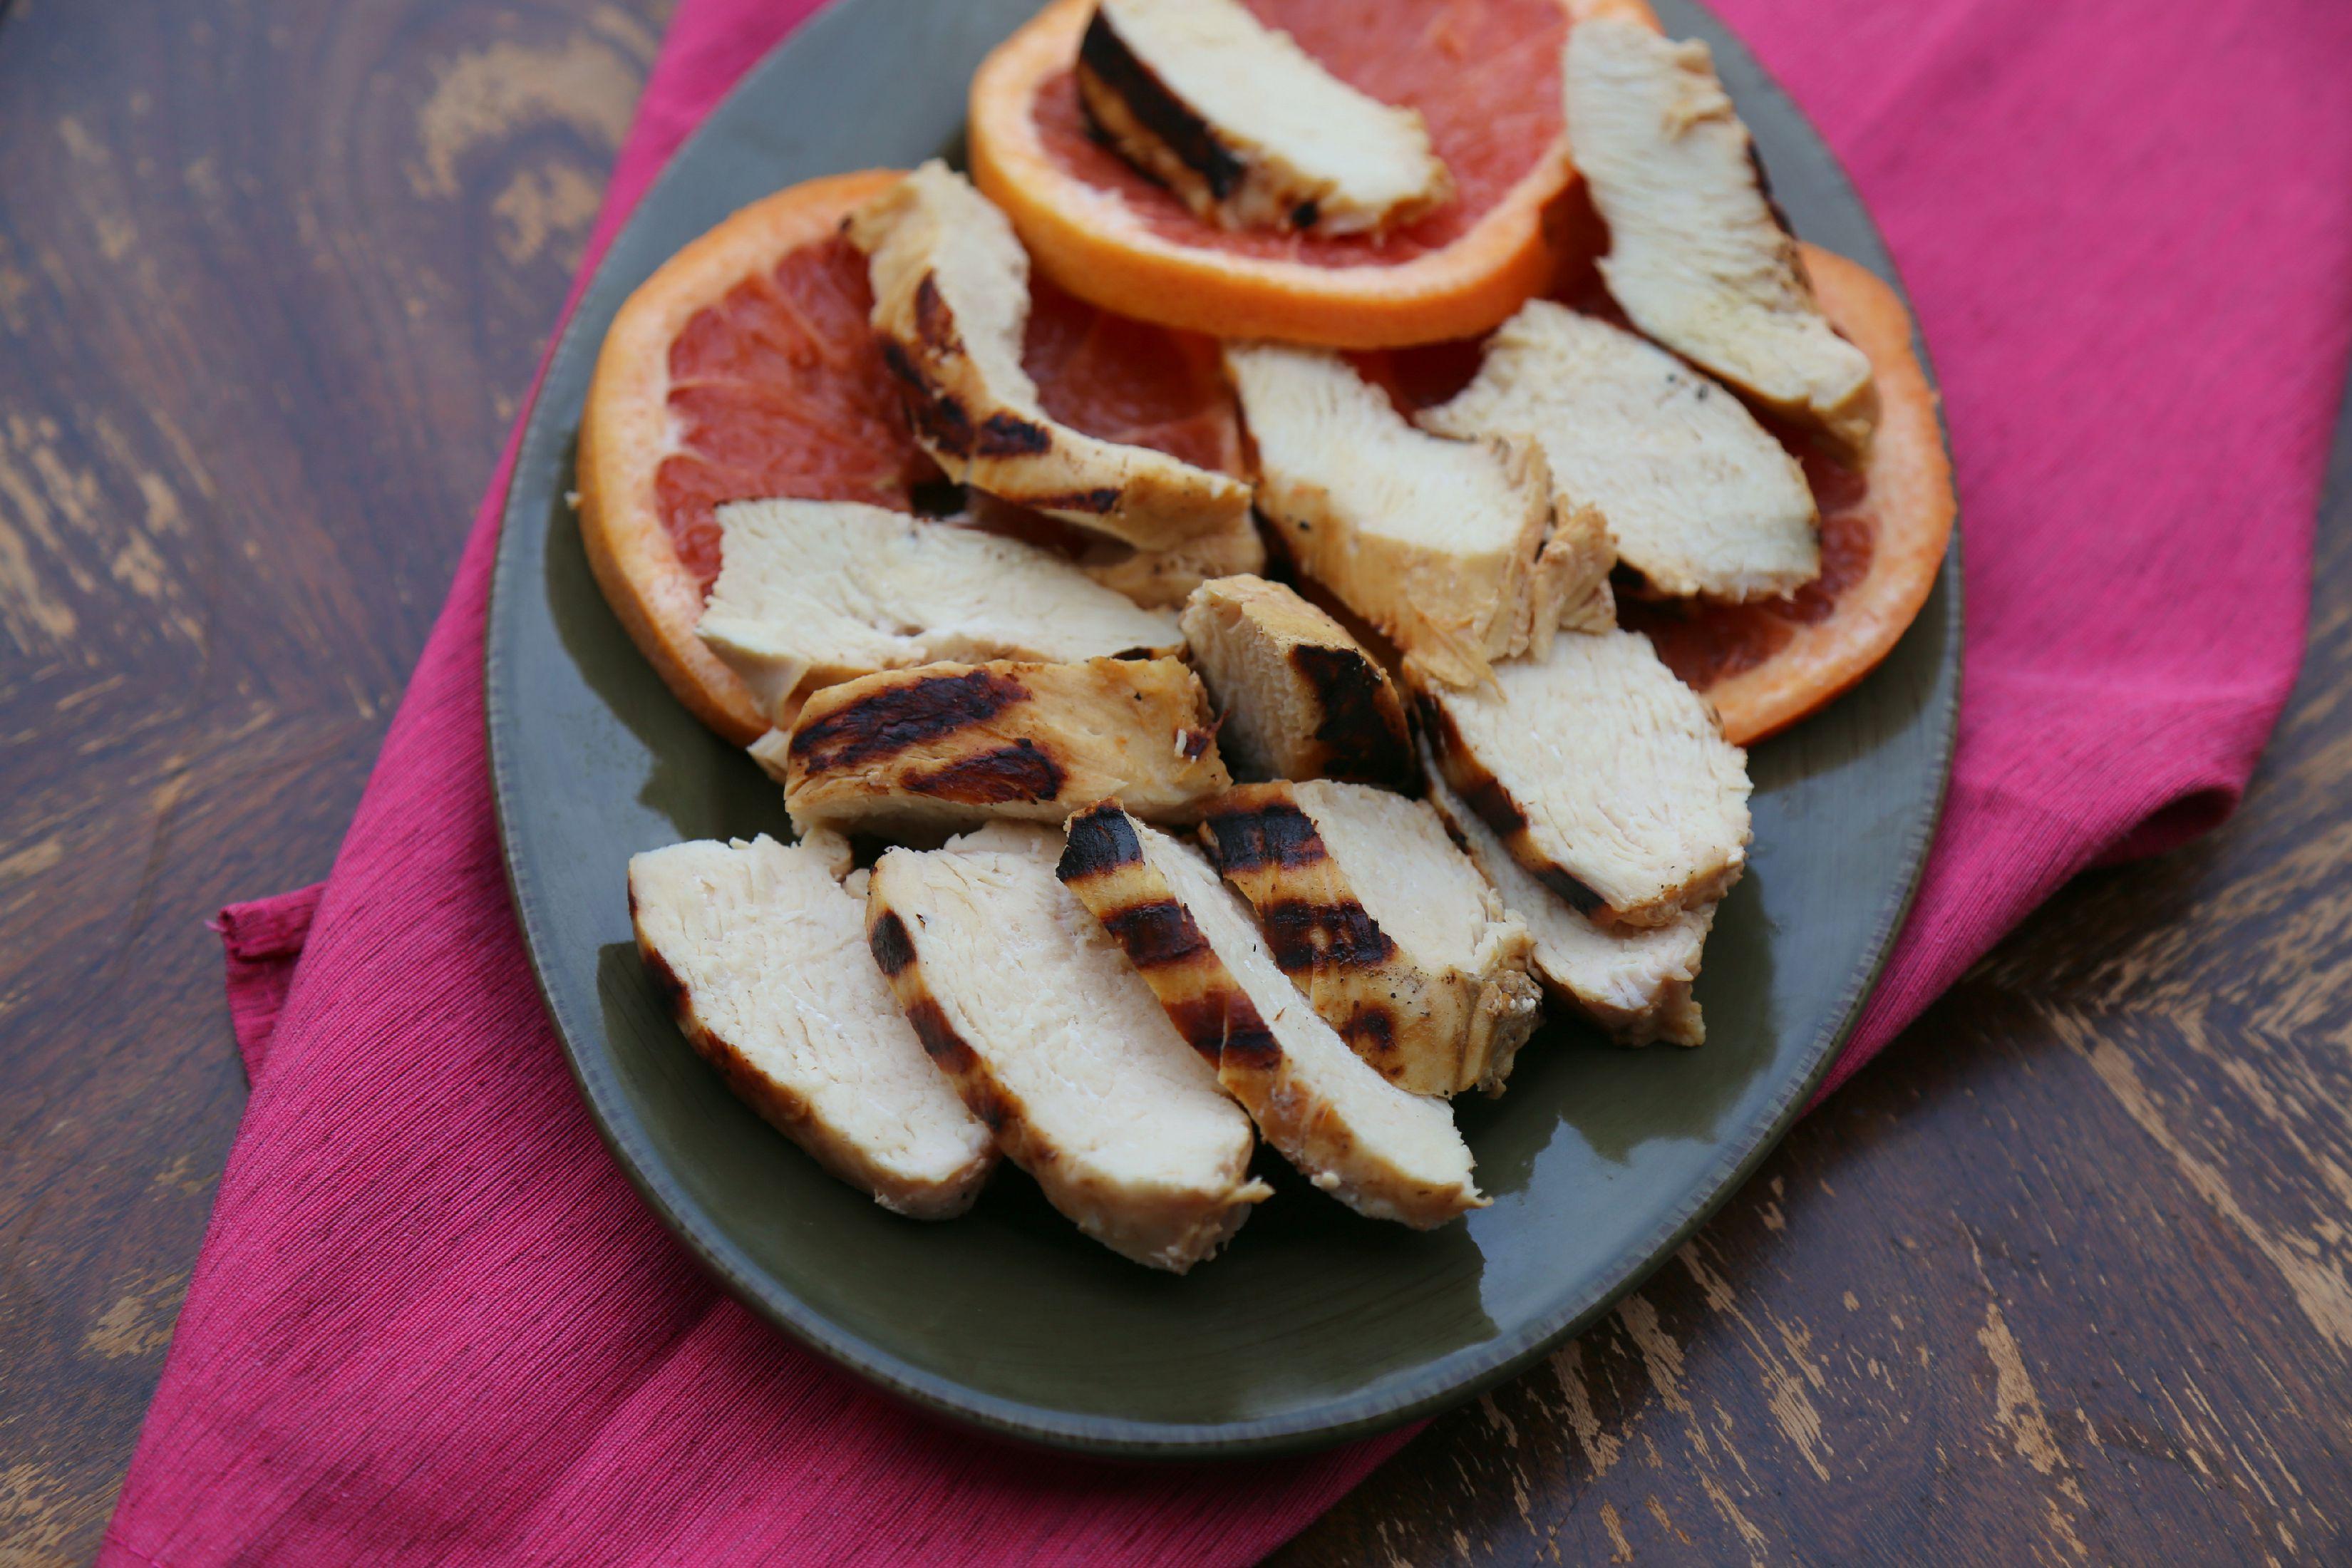 paloma-marinated-chicken-fajitas-vianneyrodriguerz-sweetlifebake